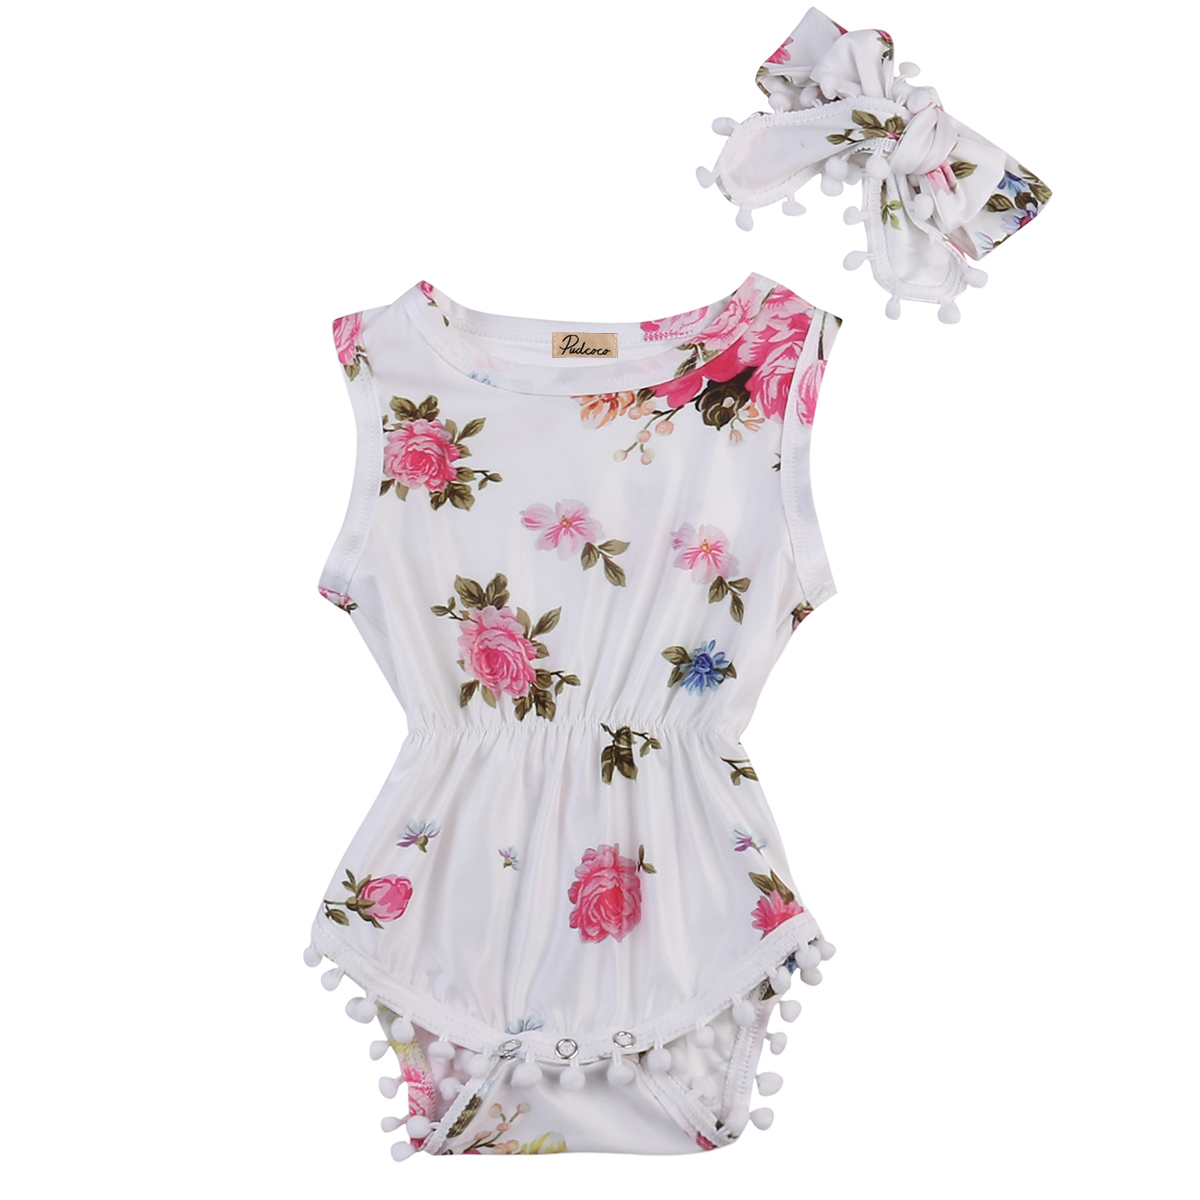 Hi Hi Baby Store Infant Baby Girls Floral Print Sleeveless Cotton  Bodysuits + Headband 0-24M